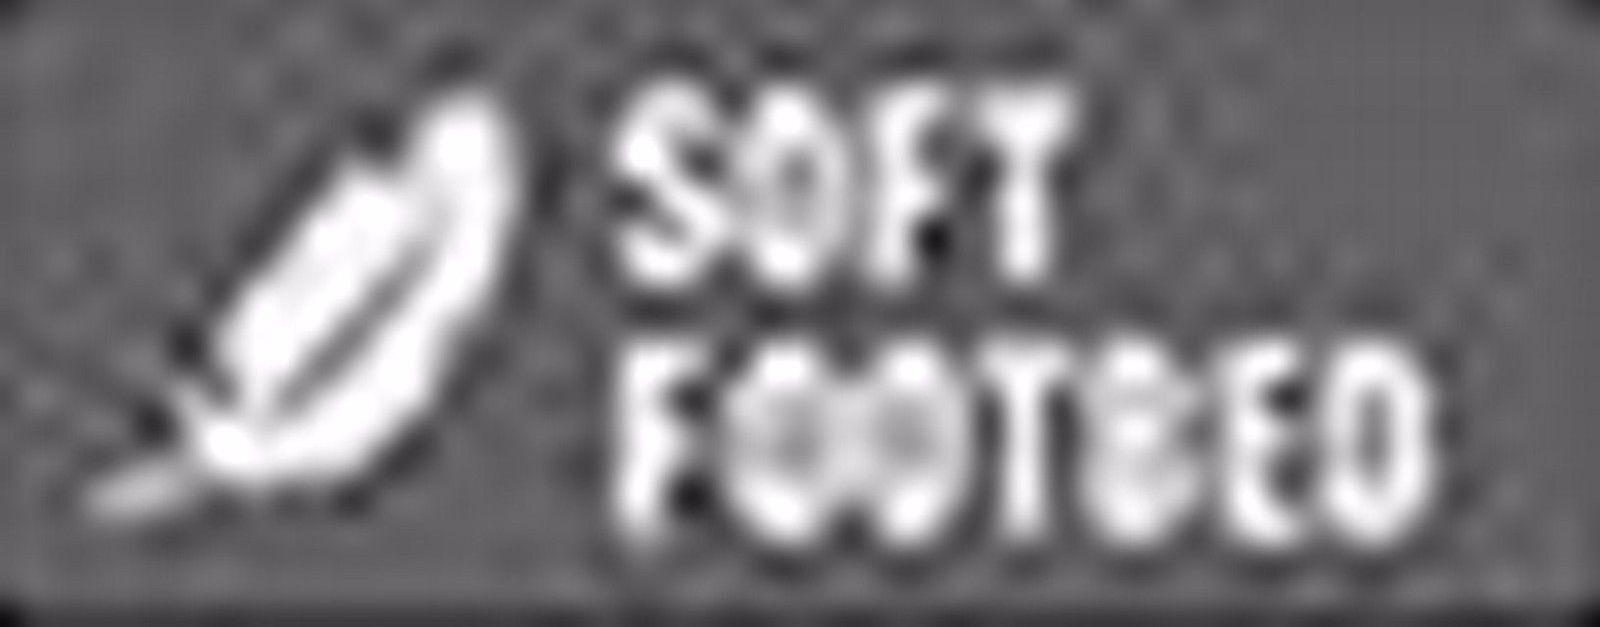 BIRKENSTOCK Arizona Weichbett normal 1005710 Fußbett desert soil night breites Fußbett 1005710 7a208a